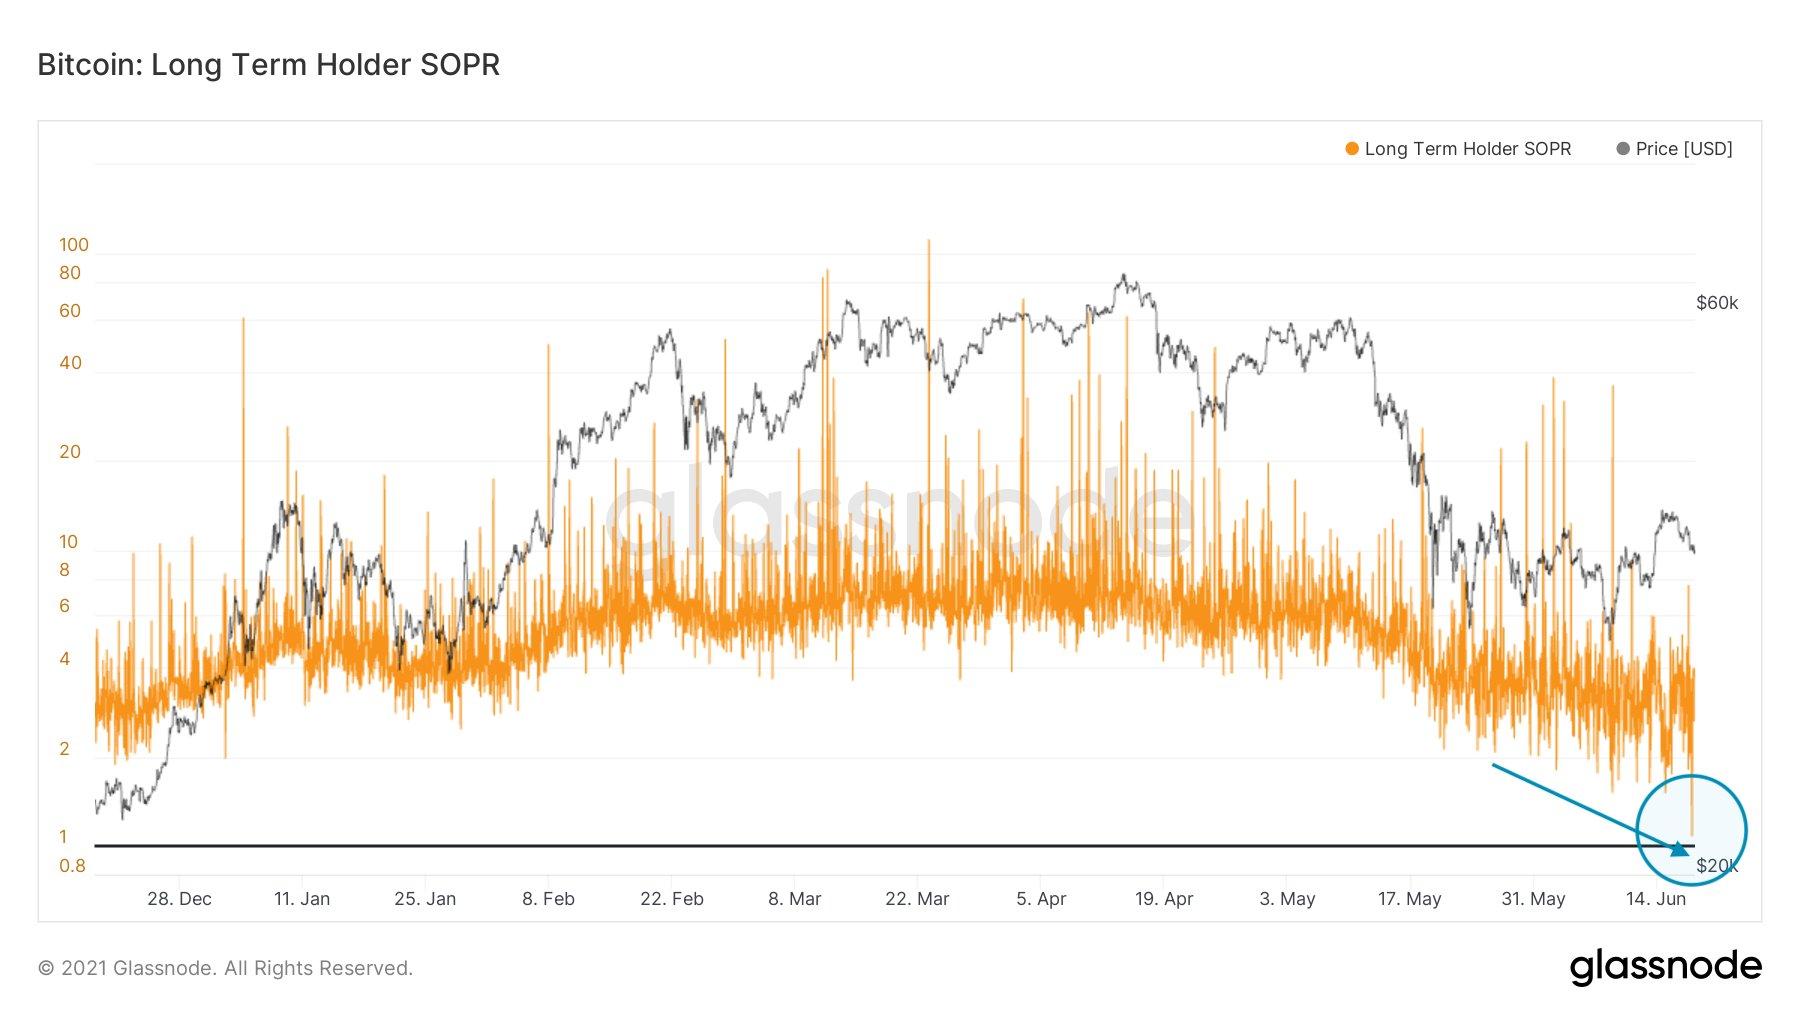 Long-term SOPR